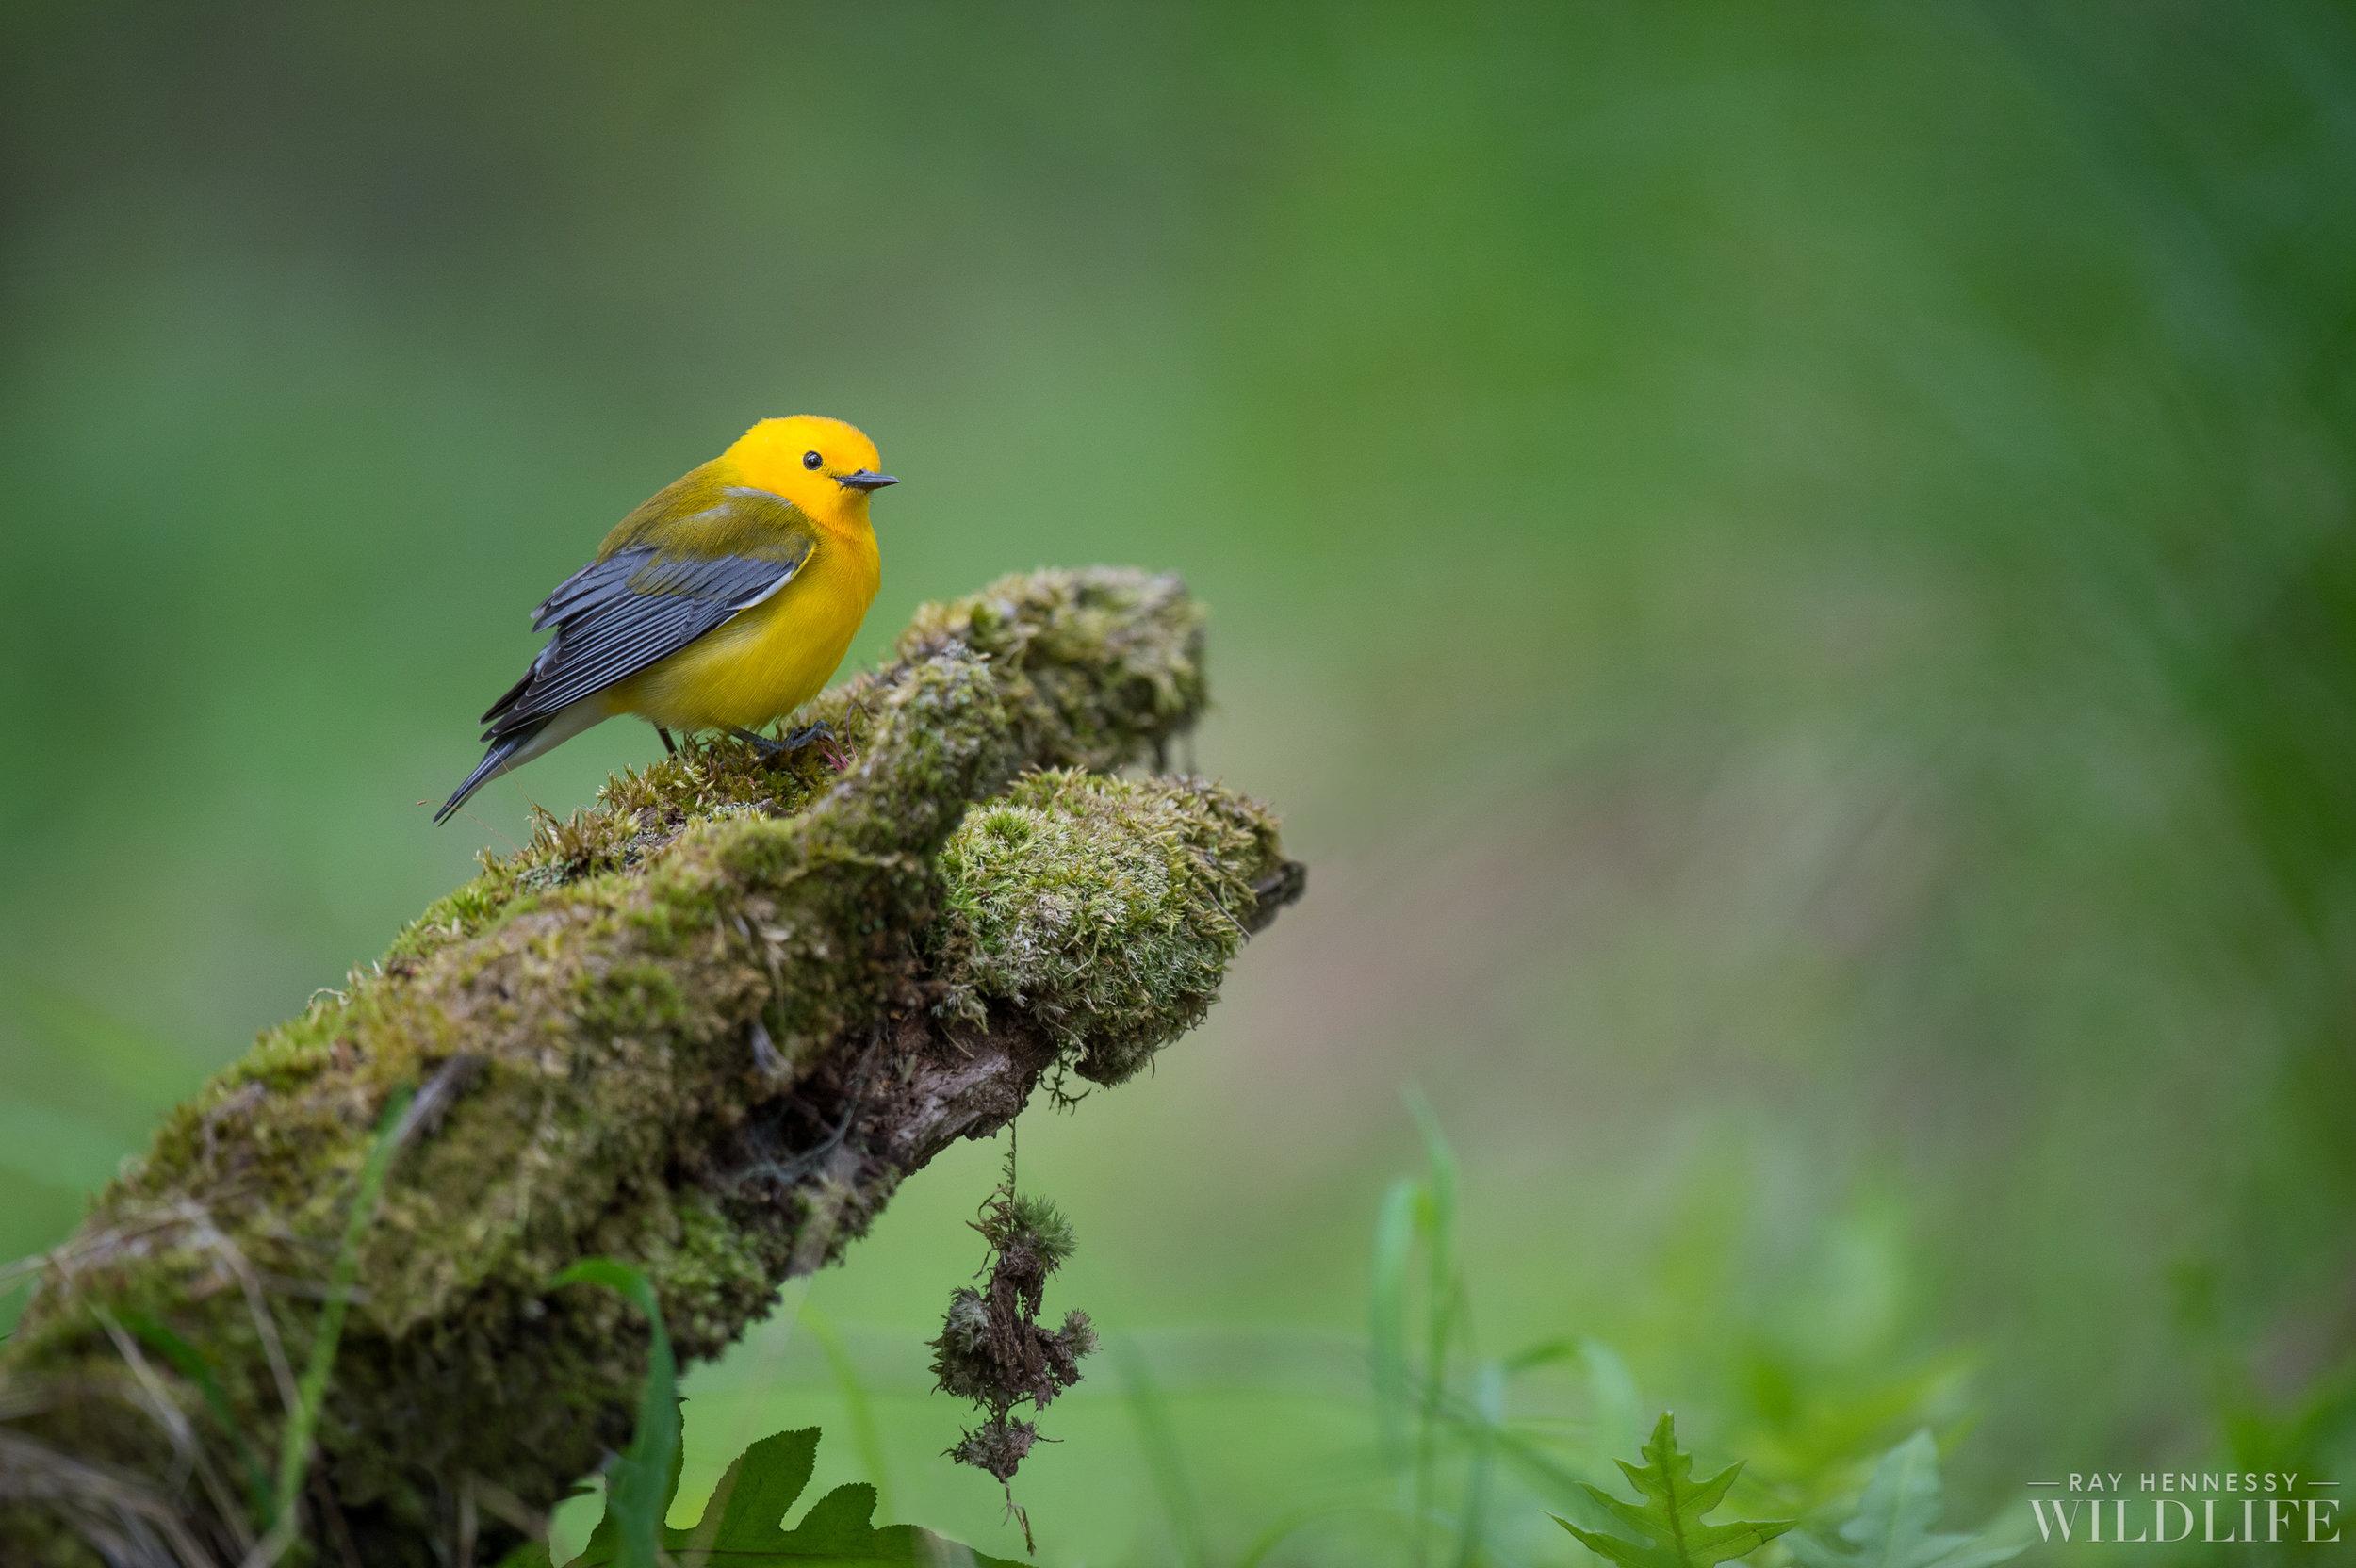 004_Prothonotary Warbler.jpg